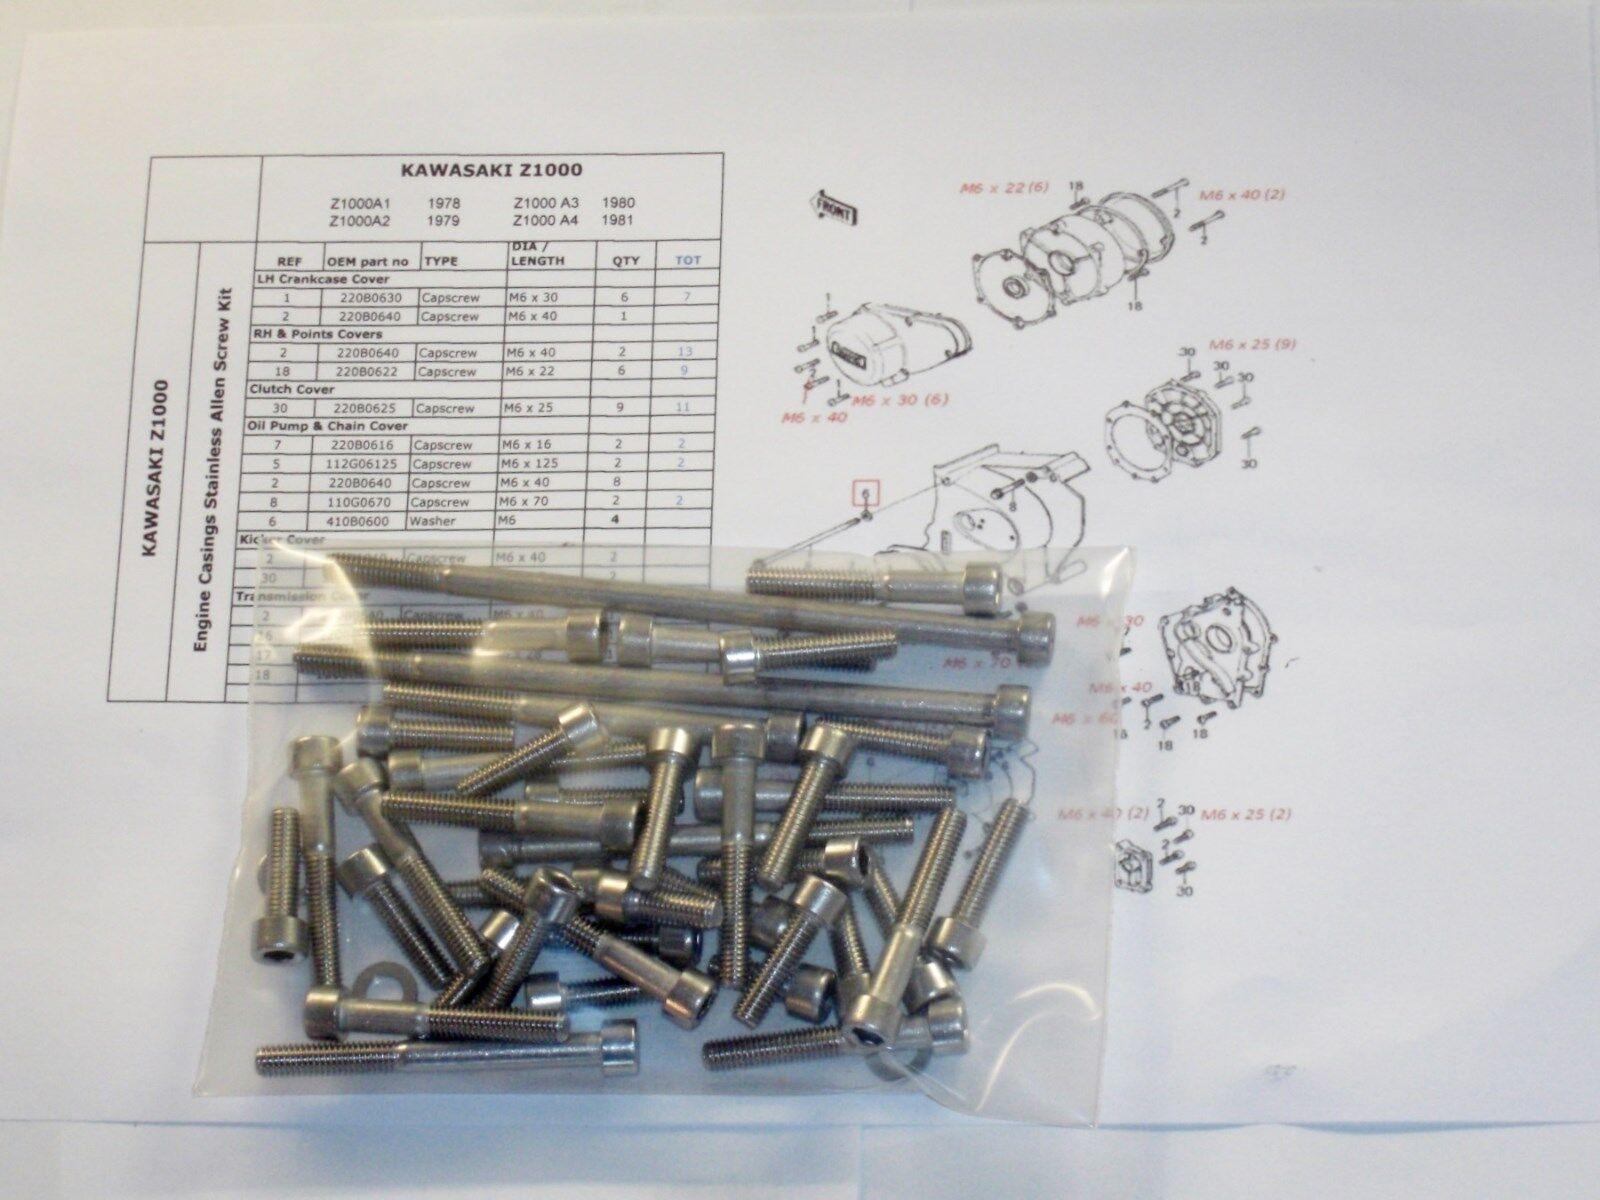 Kawasaki Z750 twin 1976-82 Engine Covers 46pc Stainless Allen Bolt Capscrew Kit